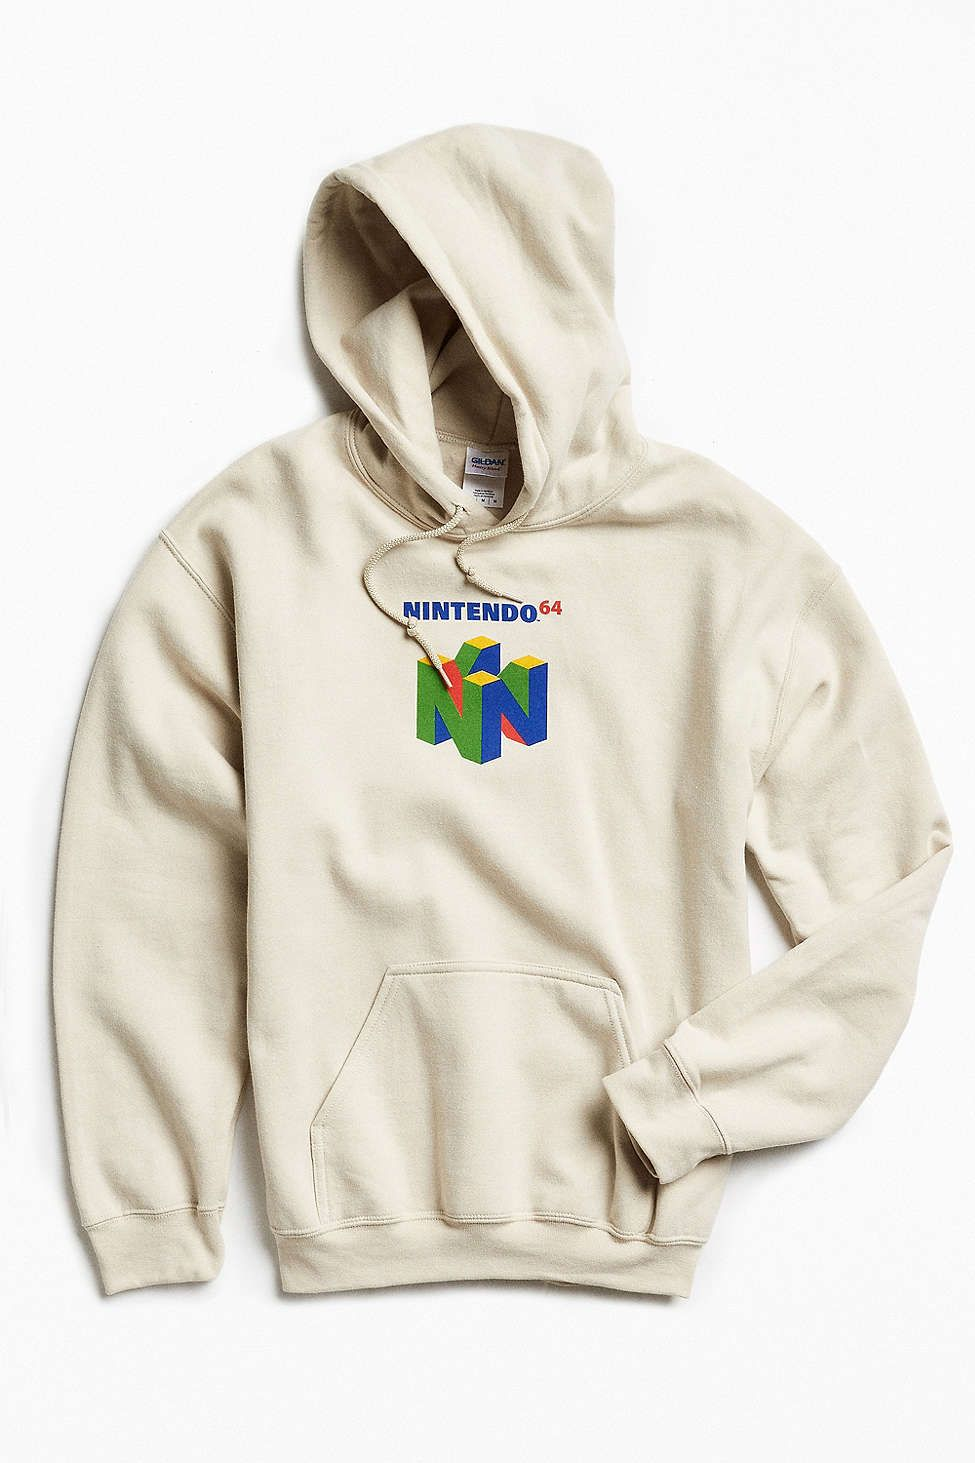 Men's Clothing Energetic Fgkks 2018 New Hoodie Hip Hop Street Wear Sweatshirts Skateboard Unisex Pullover Male Camouflage Hoodies Eu Size